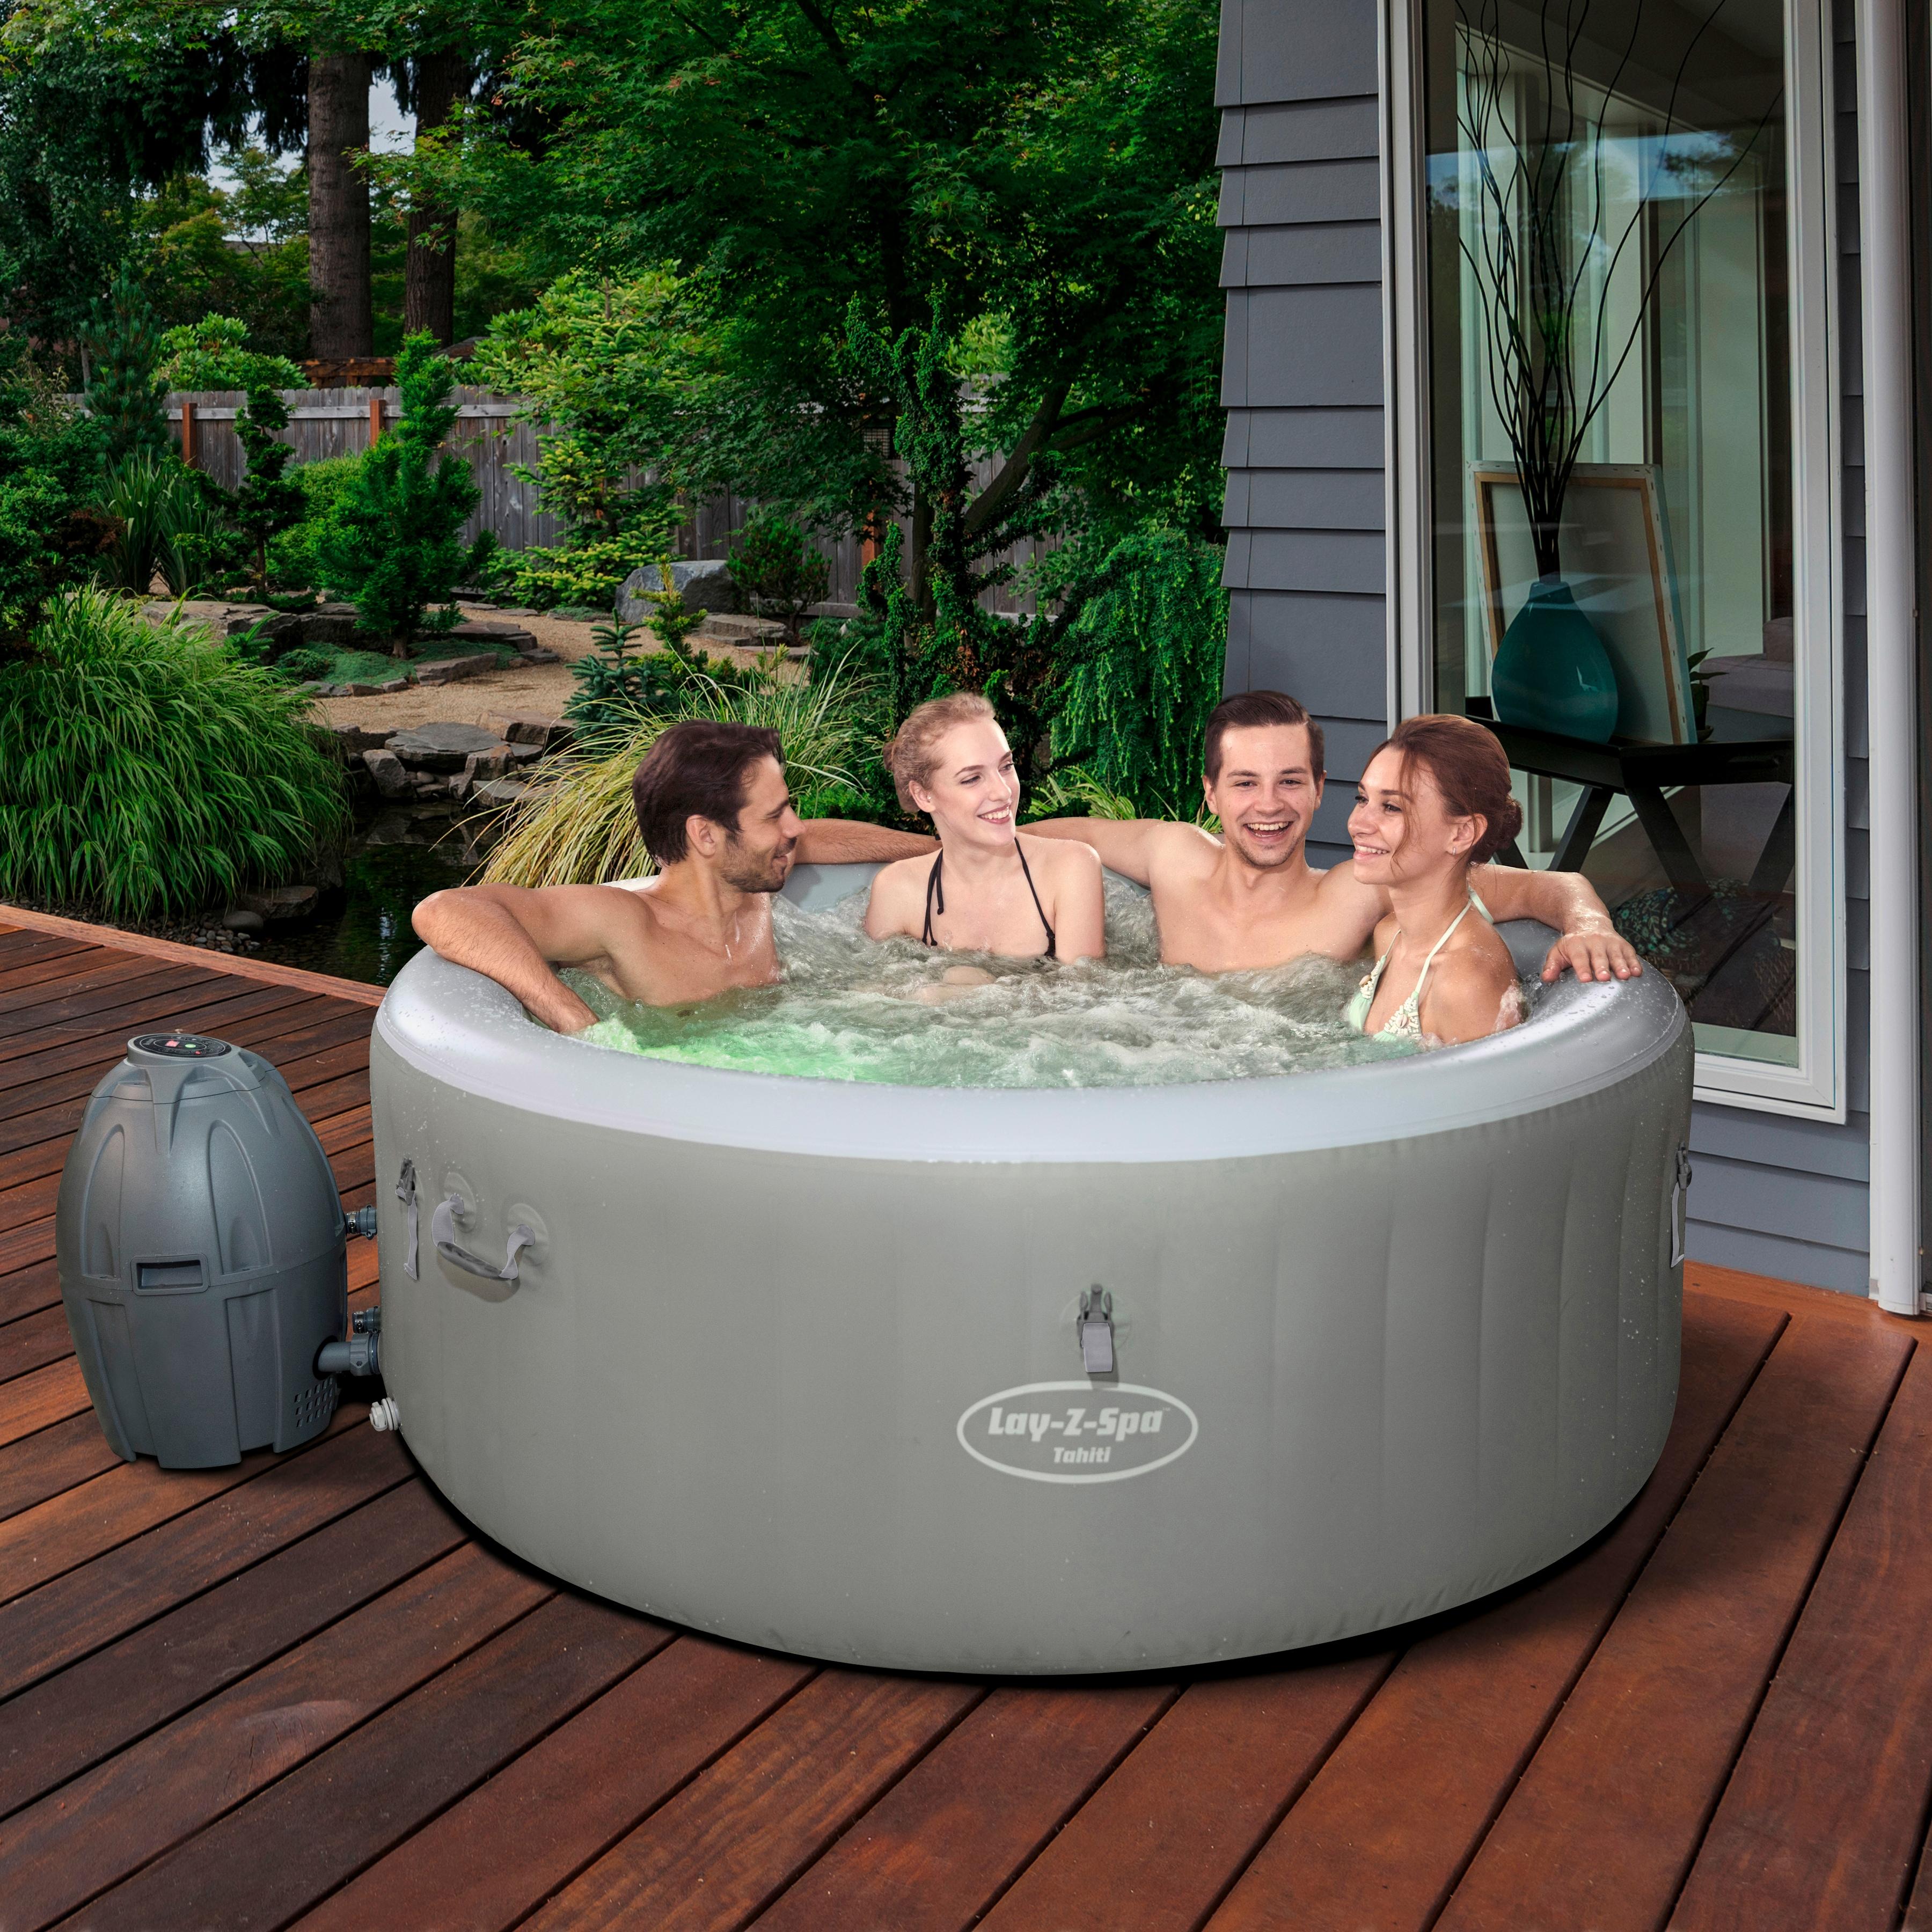 BESTWAY Set: Whirlpool »Lay-Z-Spa™ Tahiti AirJet™«, 6-tlg., ØxH: 180x66 cm   Bad > Badewannen & Whirlpools > Whirlpools   Bestway